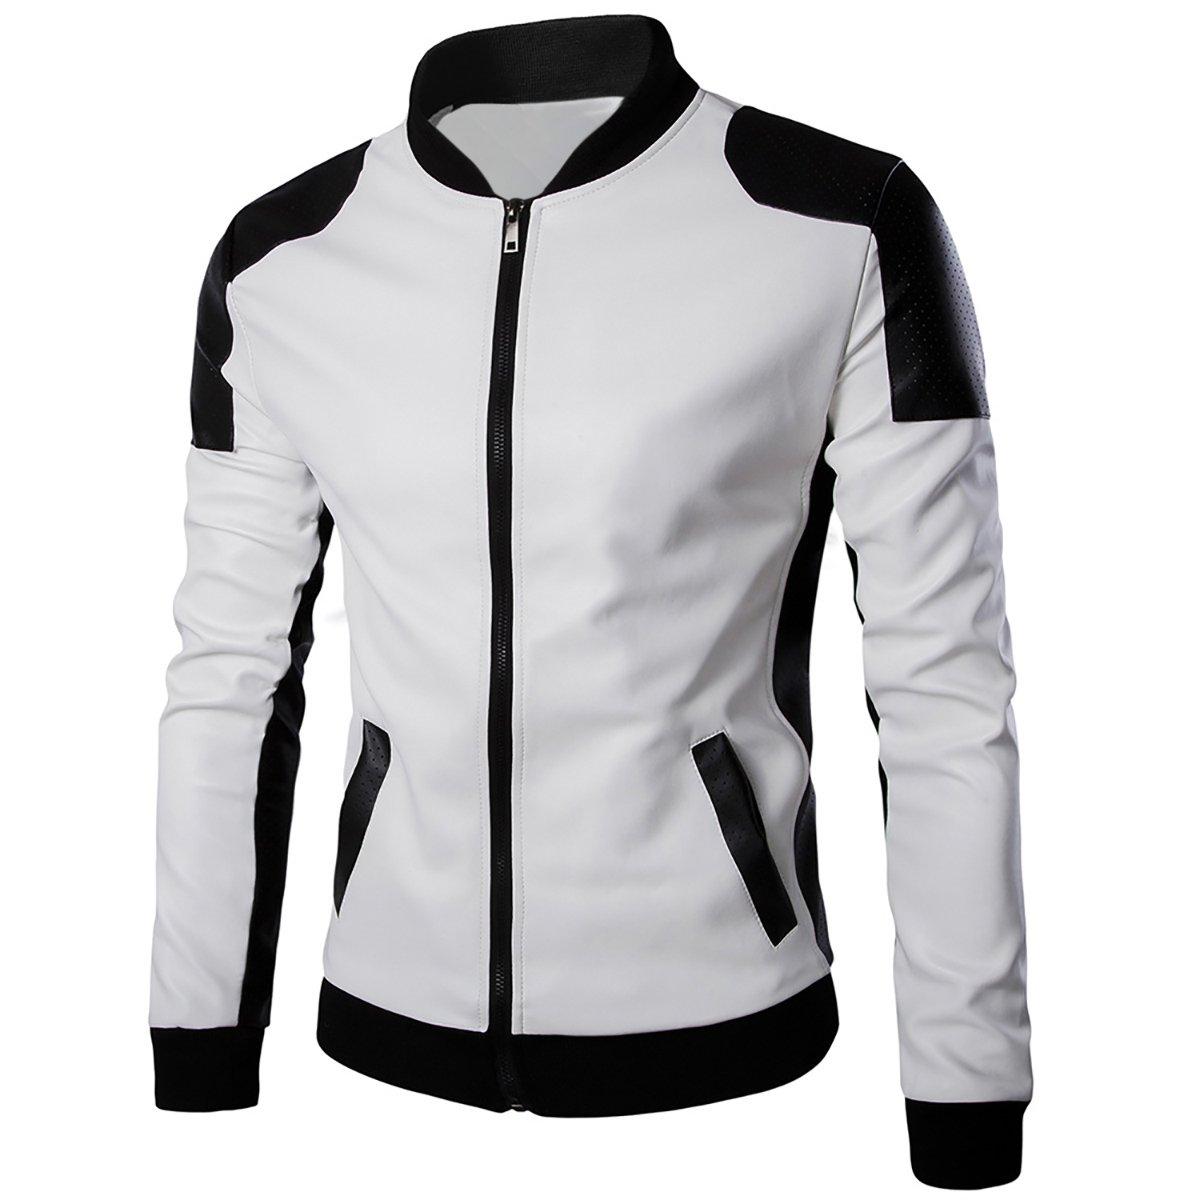 Cloudstyle Men's Latticed Baseball Bomber Jacket Slim Fit Coat,White 1,Small